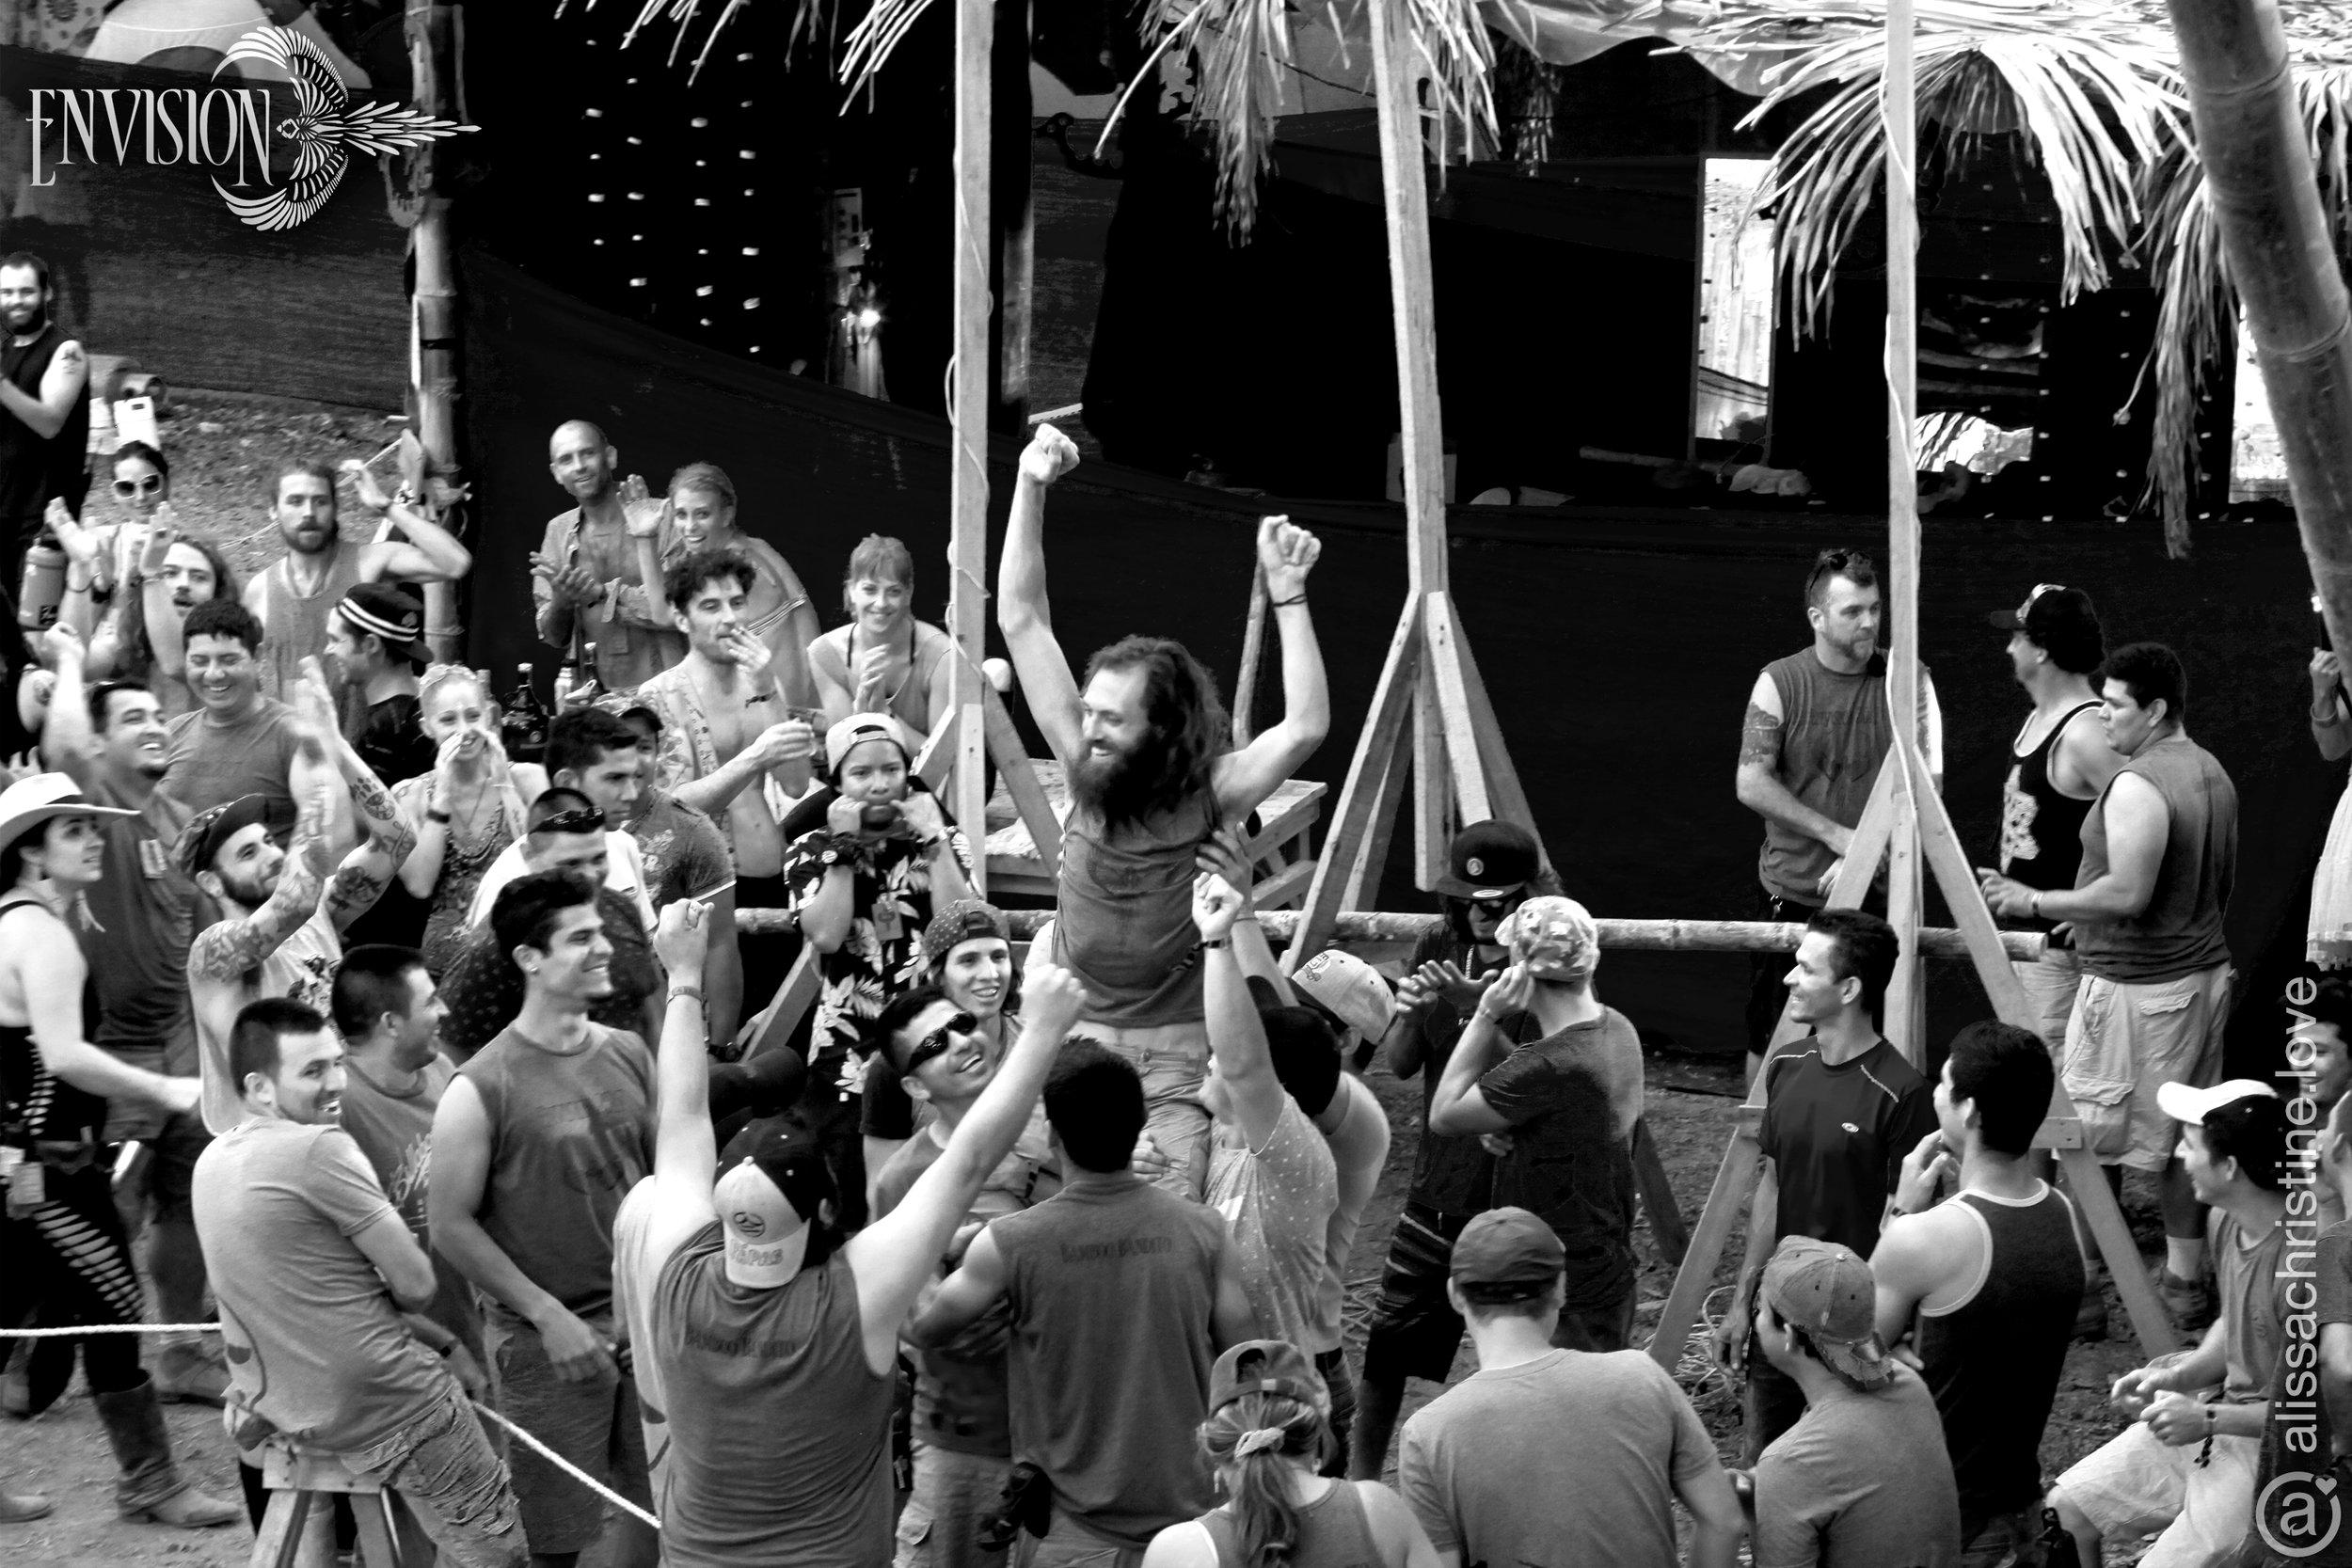 alissaChristine-ef-crowd-crew-2017-8234-lo.jpg